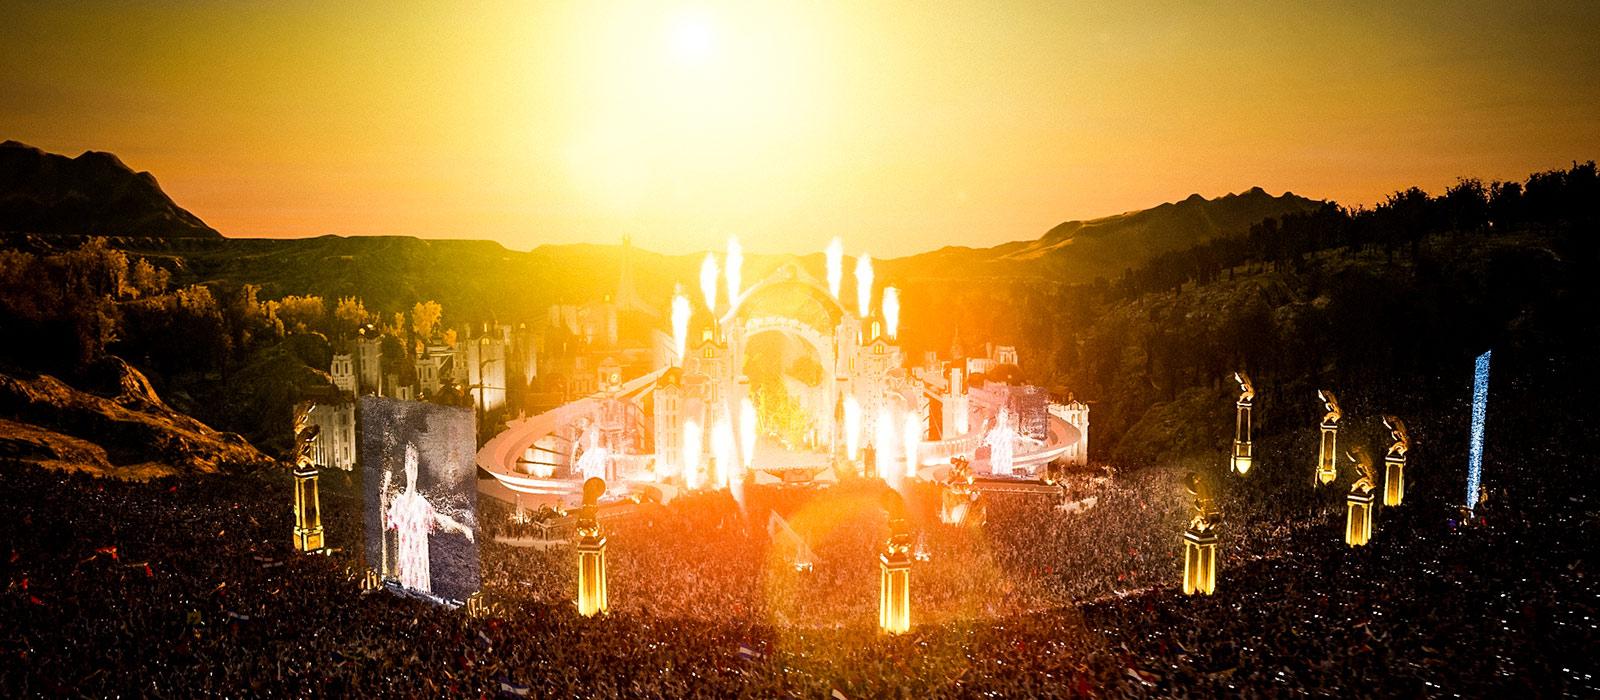 Tomorrowland - Around the World